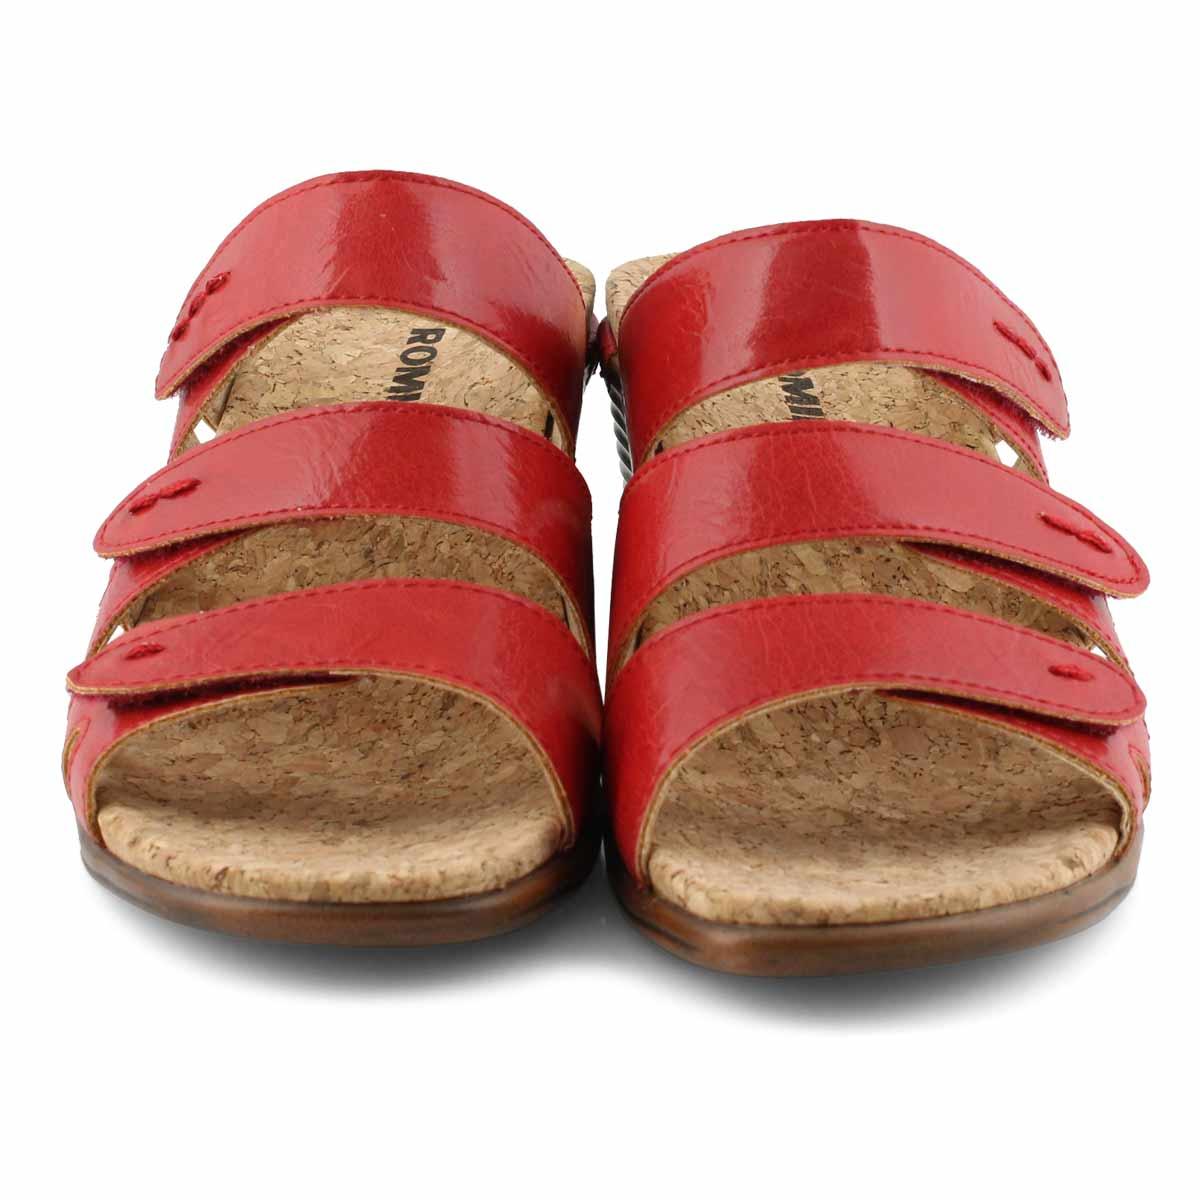 Sandale, Calgary 01 rouge, femmes